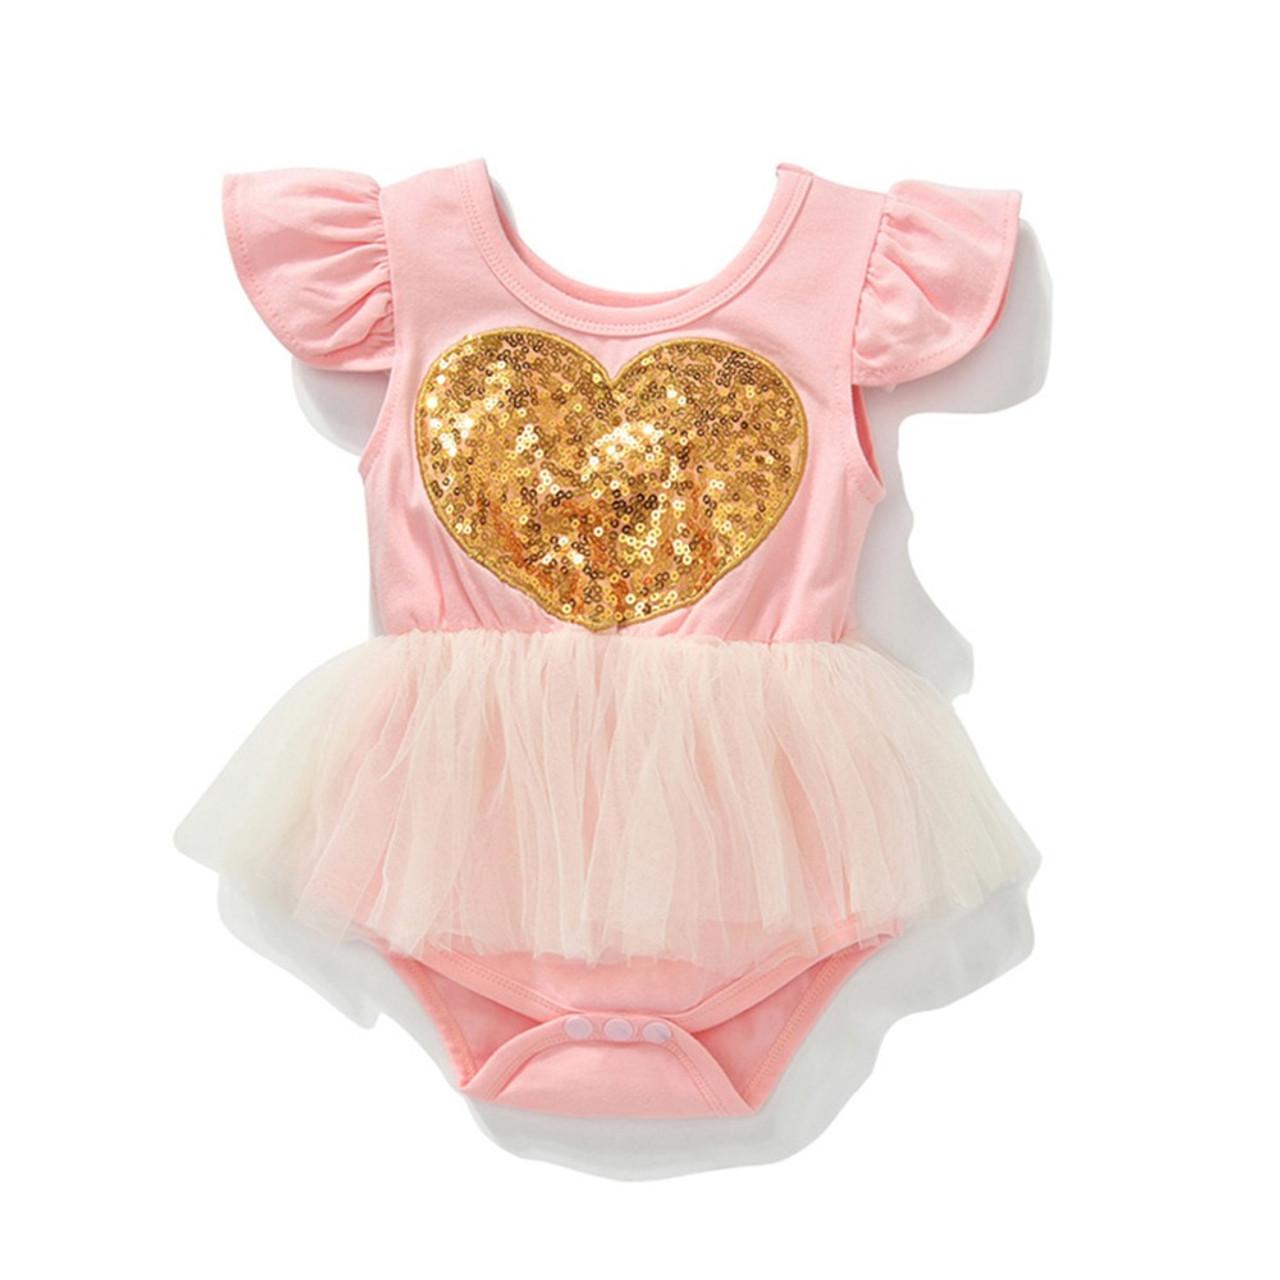 0b1ef875ca04 Baby Girl s Birthday or Valentine Pink   Gold Heart Tutu Romper - front